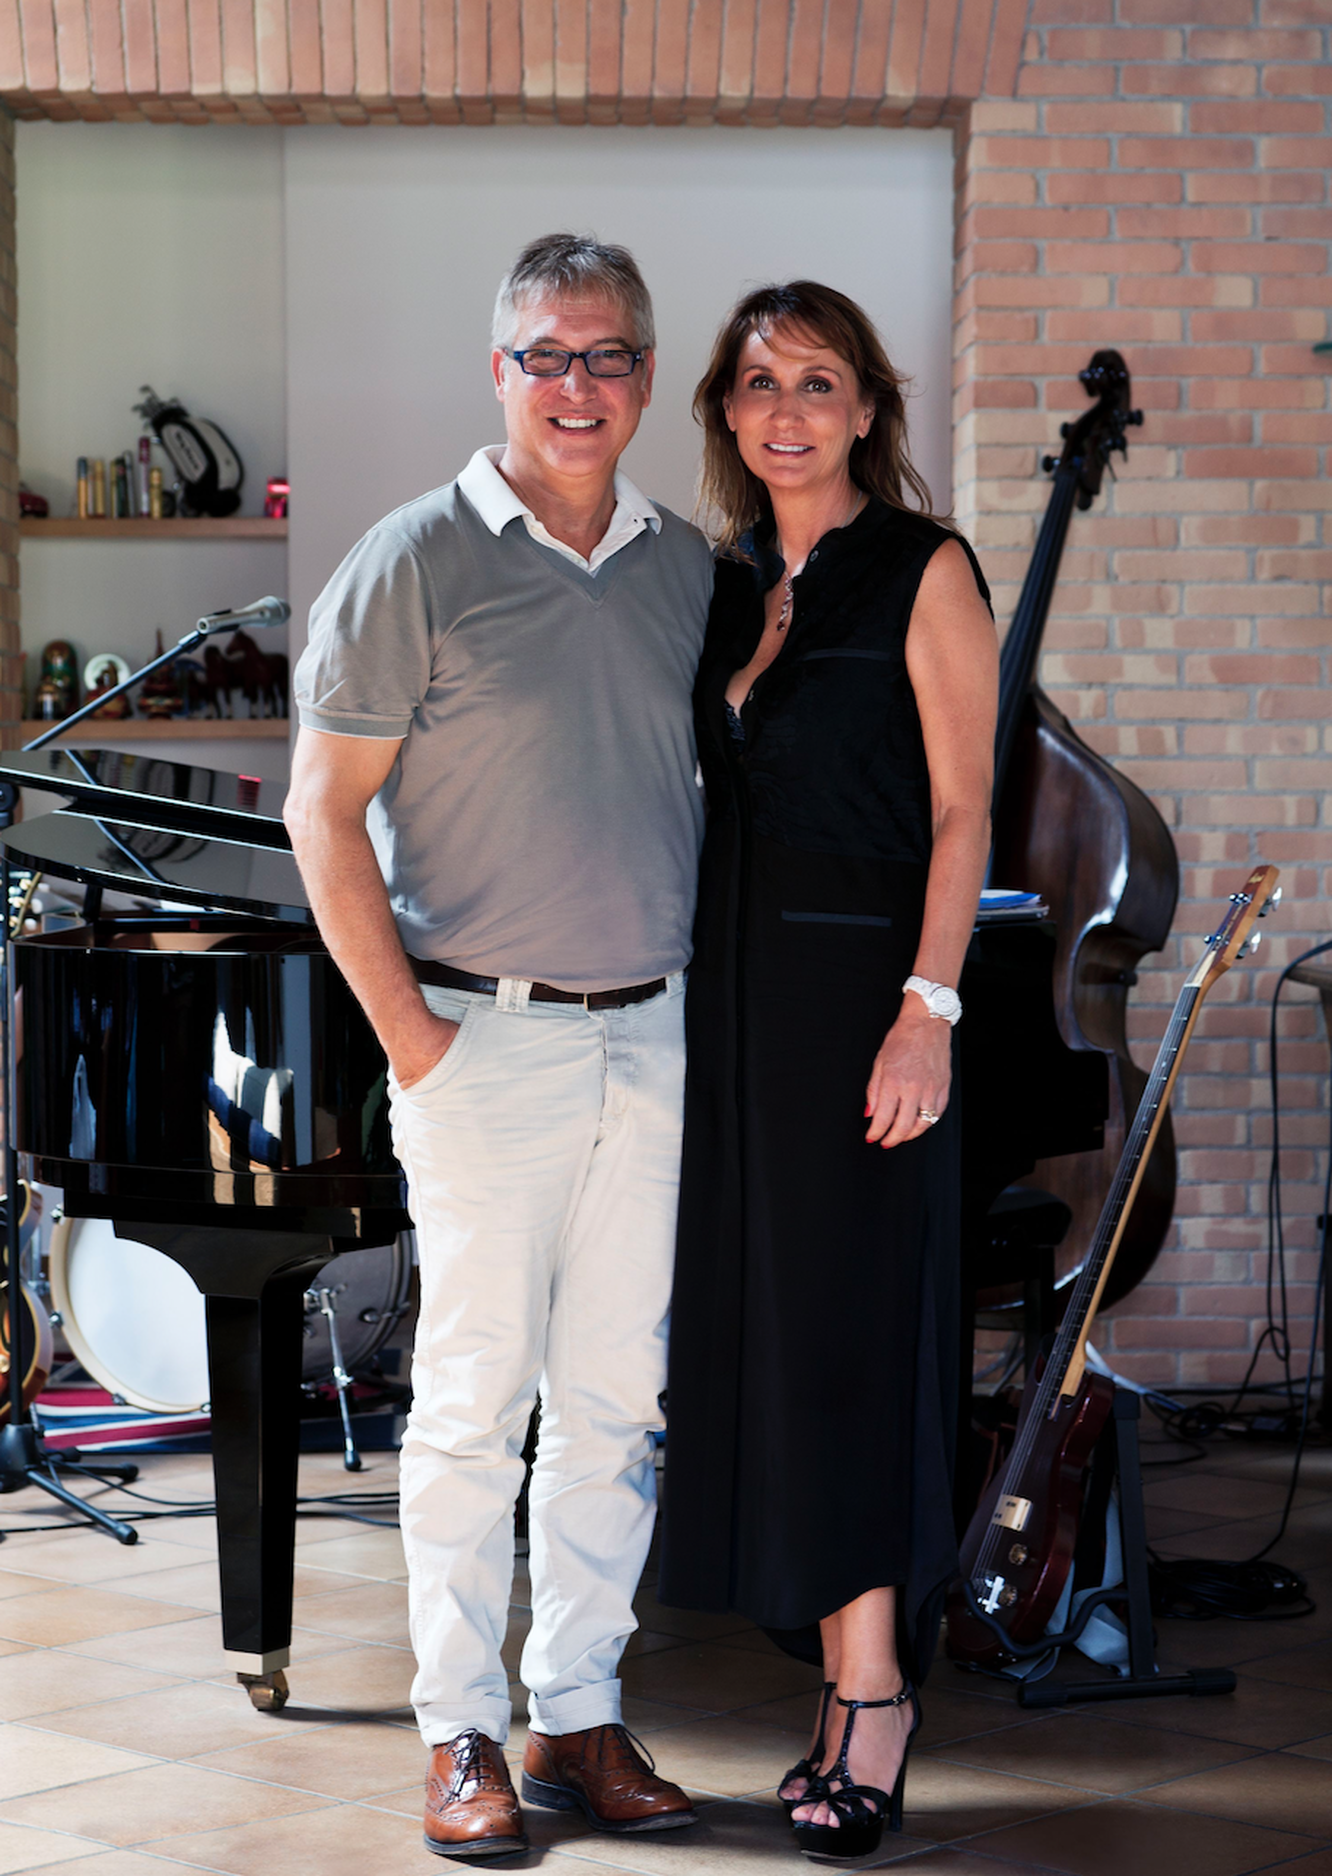 Диего Мацци и Мануэла Бортоламеолли